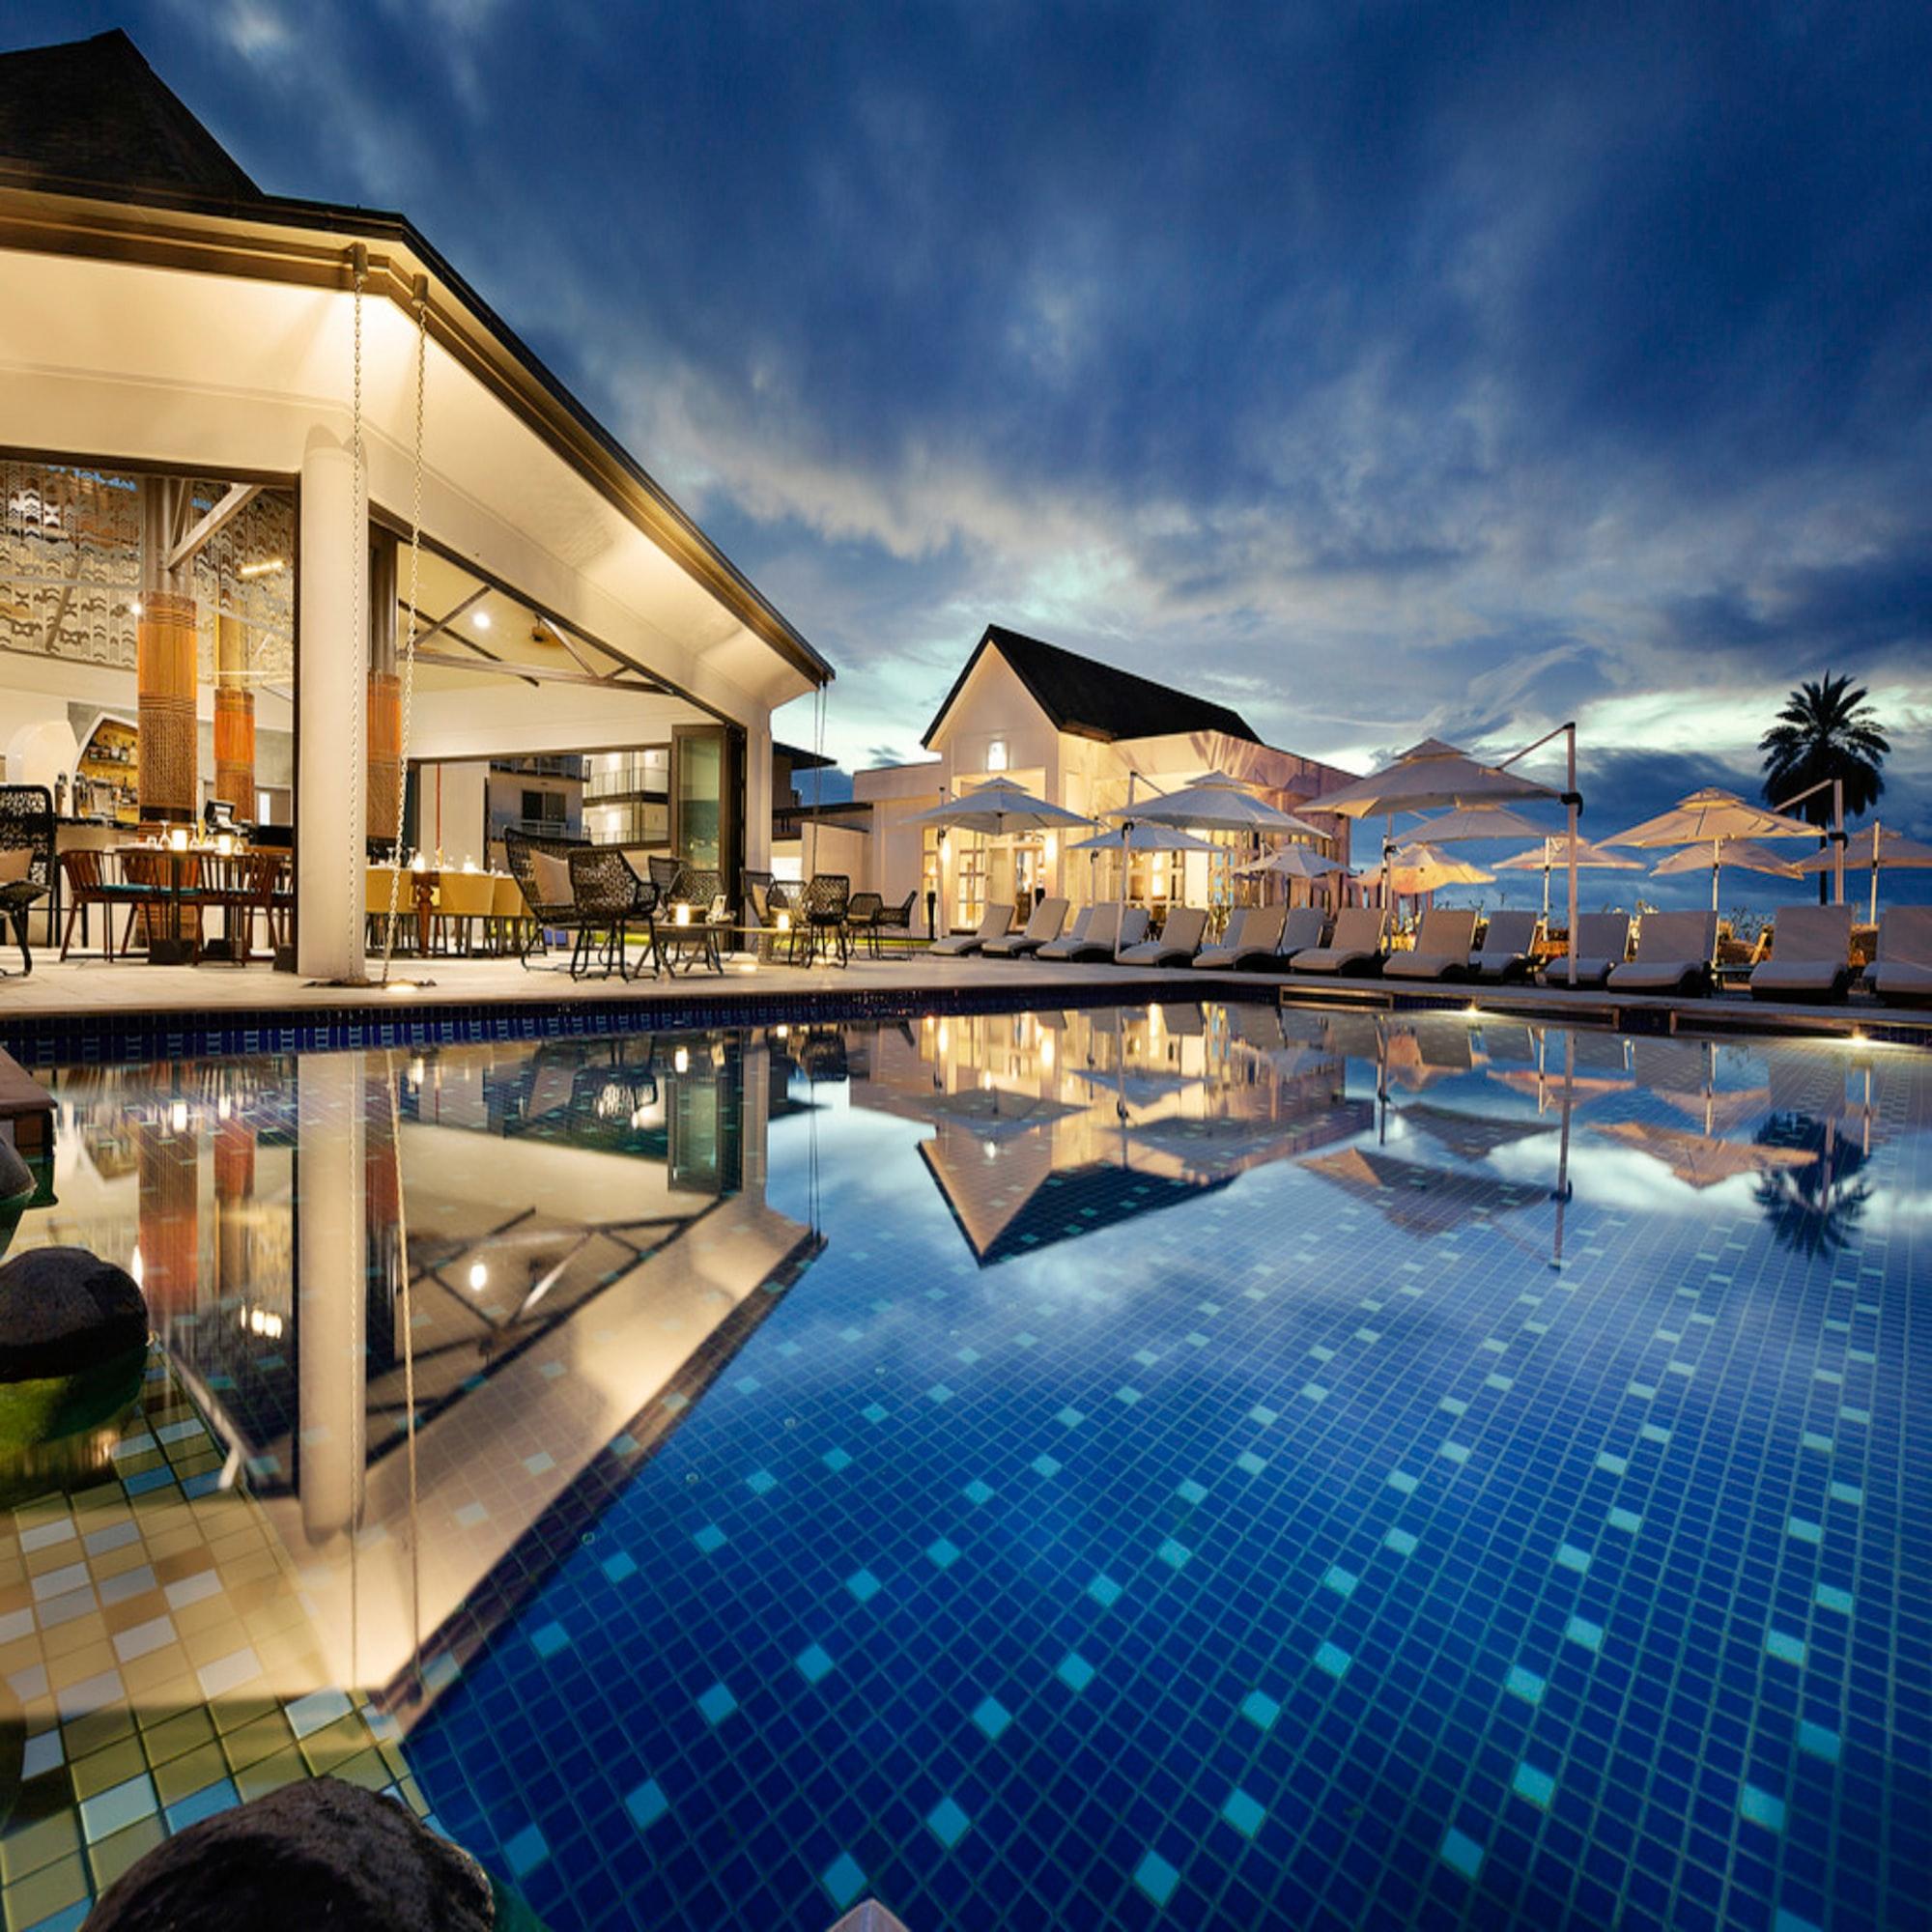 #travel(s) #traveltuesday. #travelblog. #travelblogger. #vacation. #holiday. General: #throwbackthursday. #tbt. #waybackwednesday. #workoutwednesday. #tgif. #friday. Hotel: #hotel(s) #besthotel(s) #luxuryhotel. #boutiquehotel. #luxurytraveller. #pool. Instagram